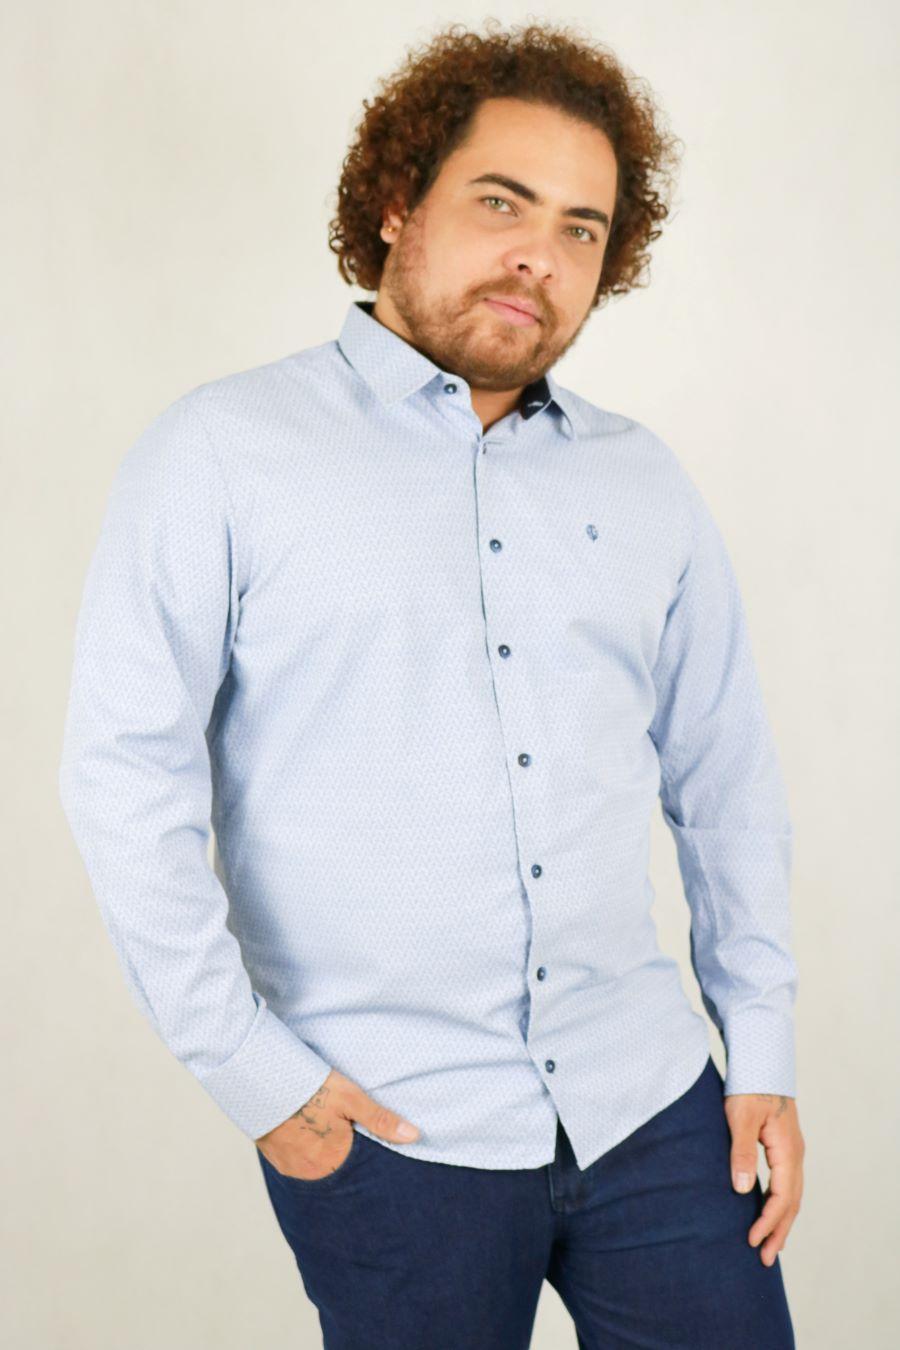 Camisa Obeland+ m/l diferenciada estilos LE